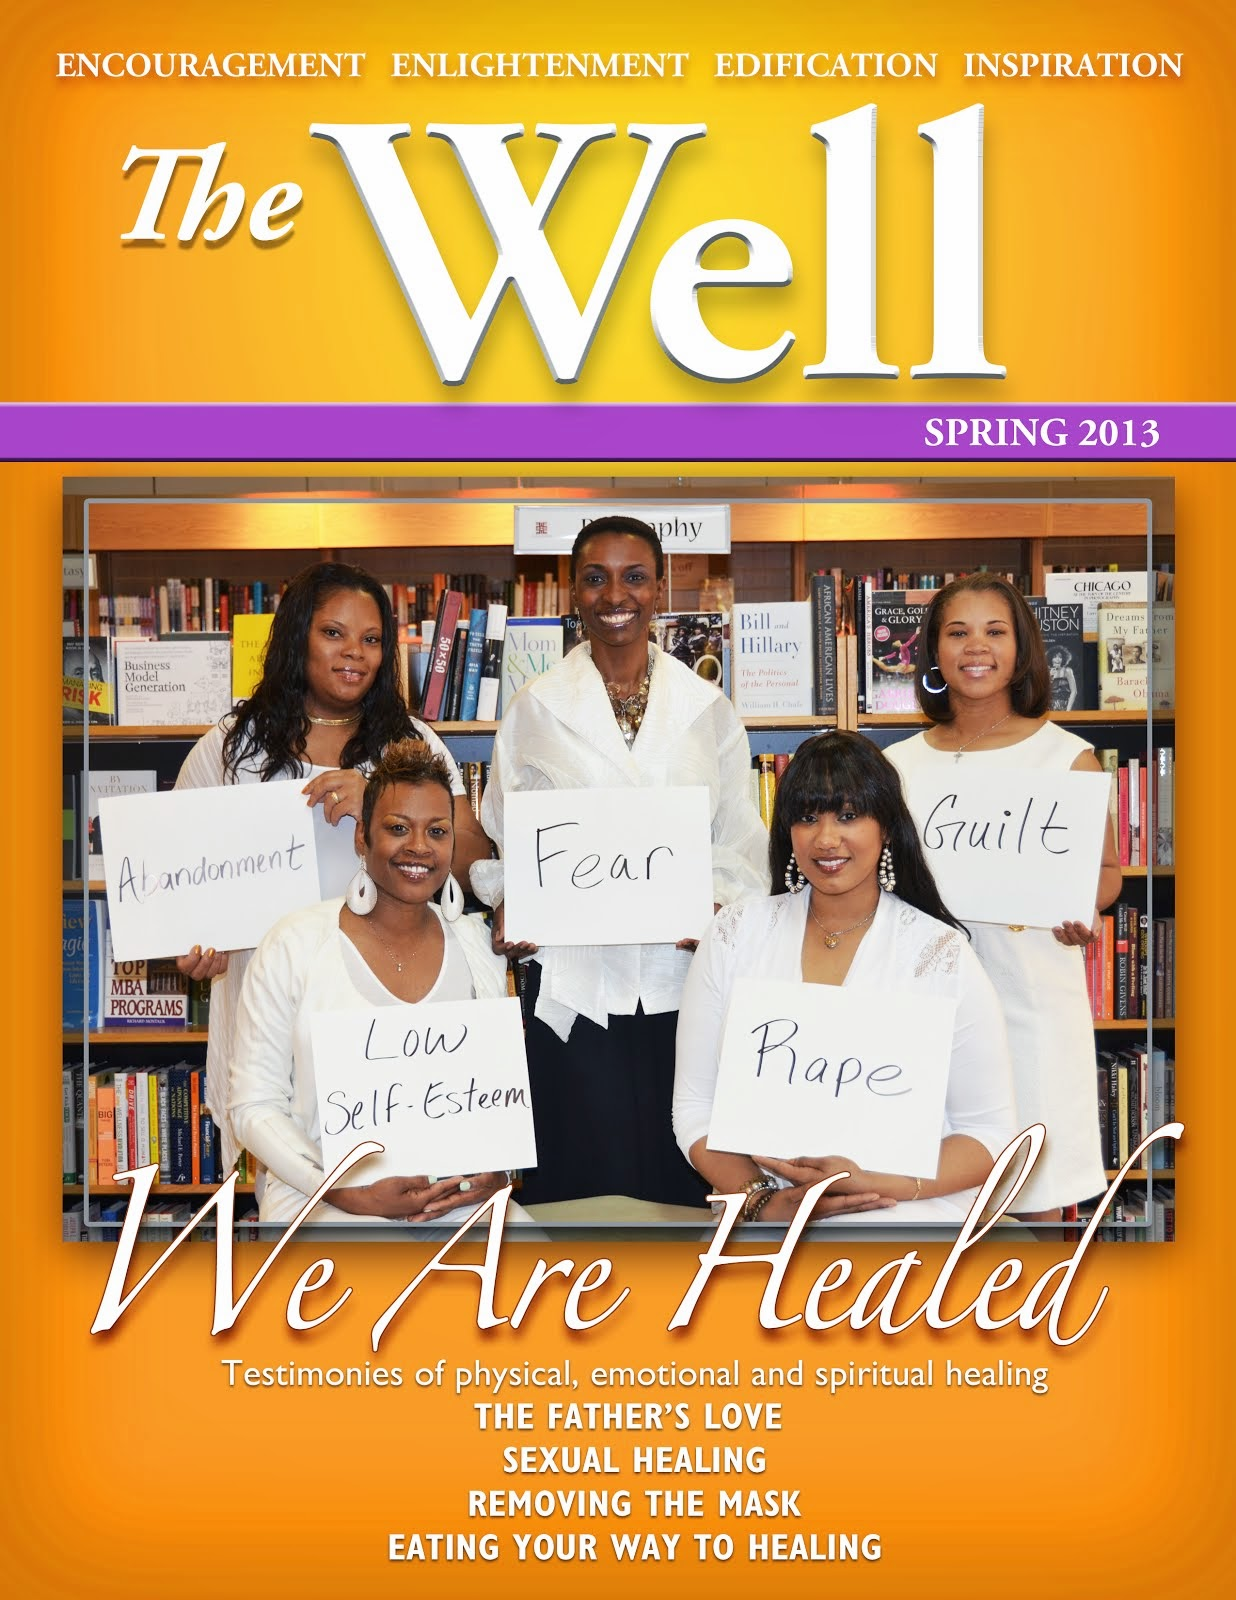 http://www.thewellmagazine.blogspot.com/p/resources.html